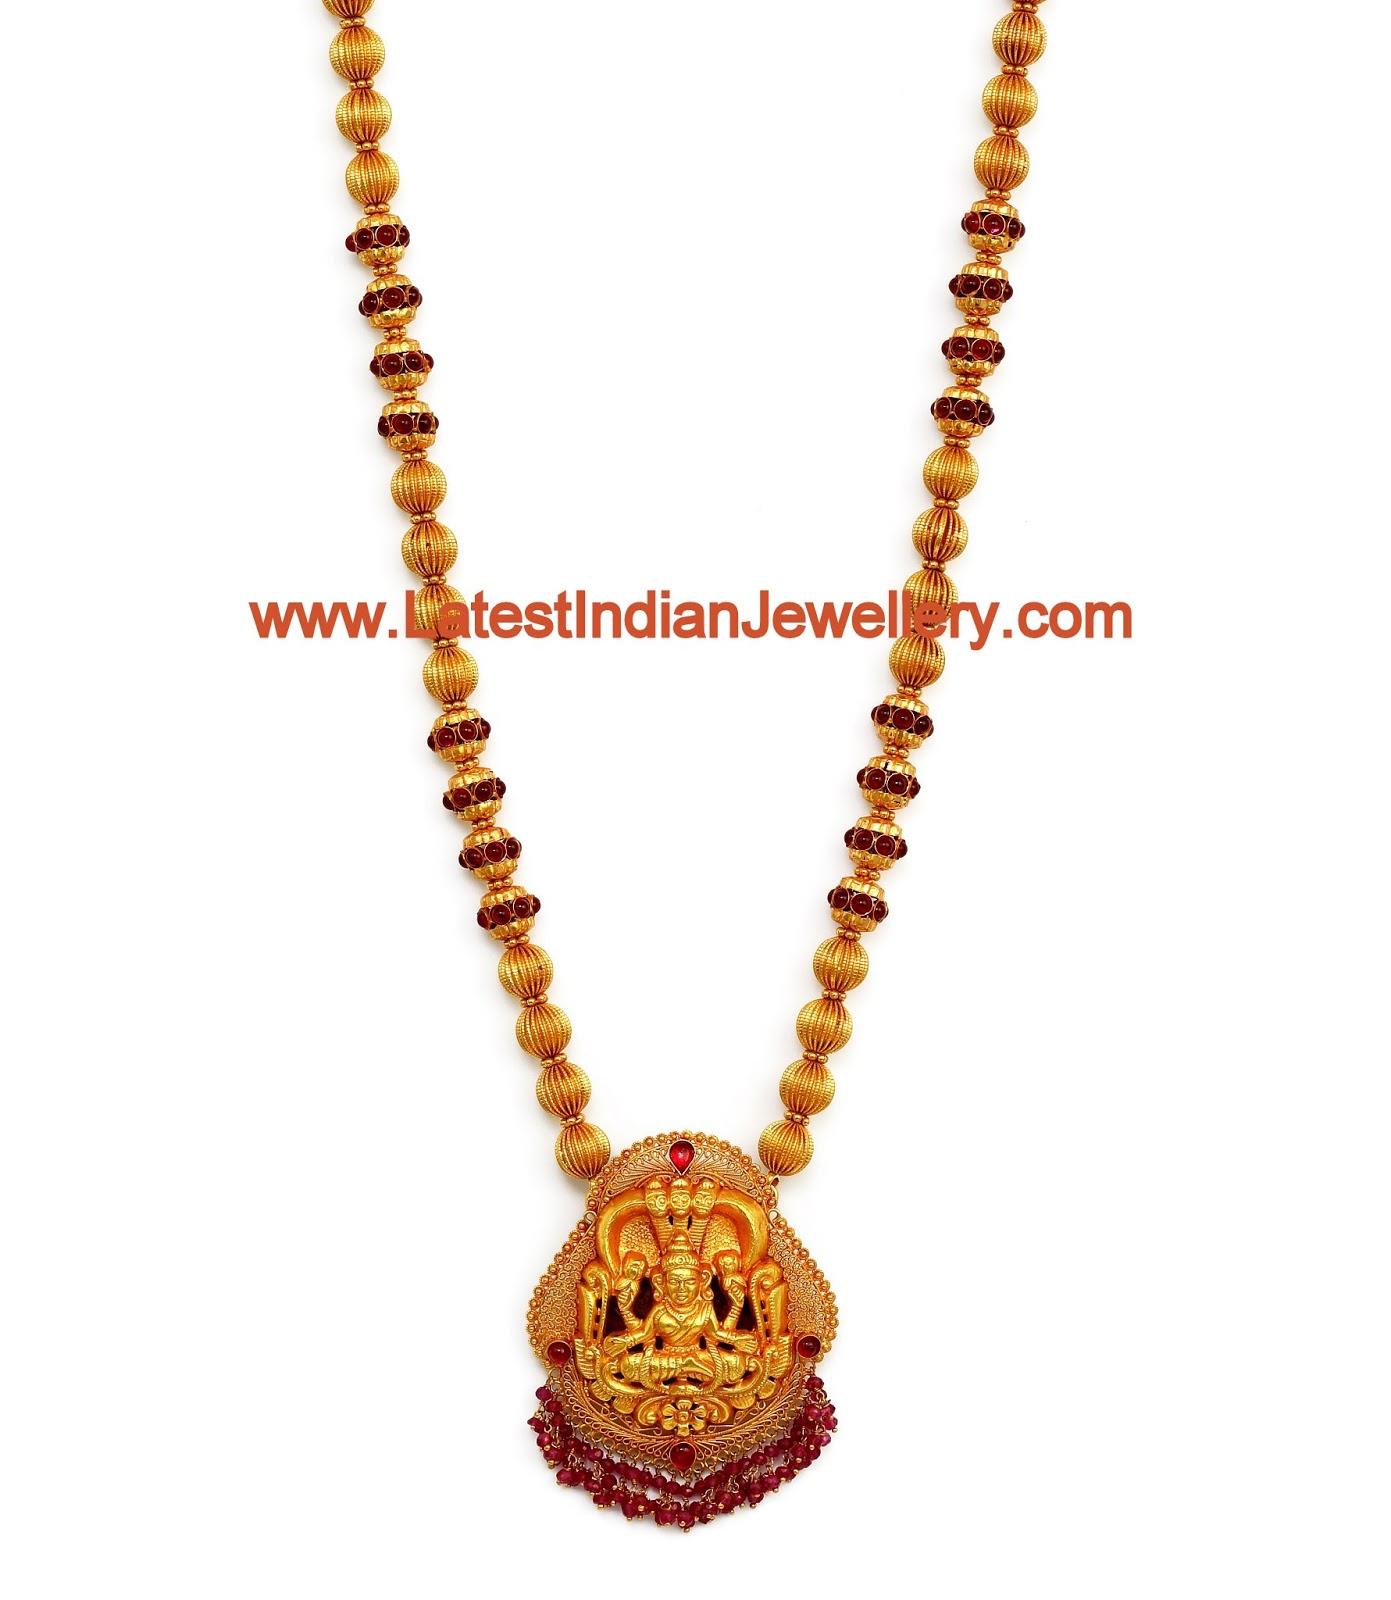 Bhima Jewellery Bands: Classic Temple Jewellery Design In 22 Karat Gold